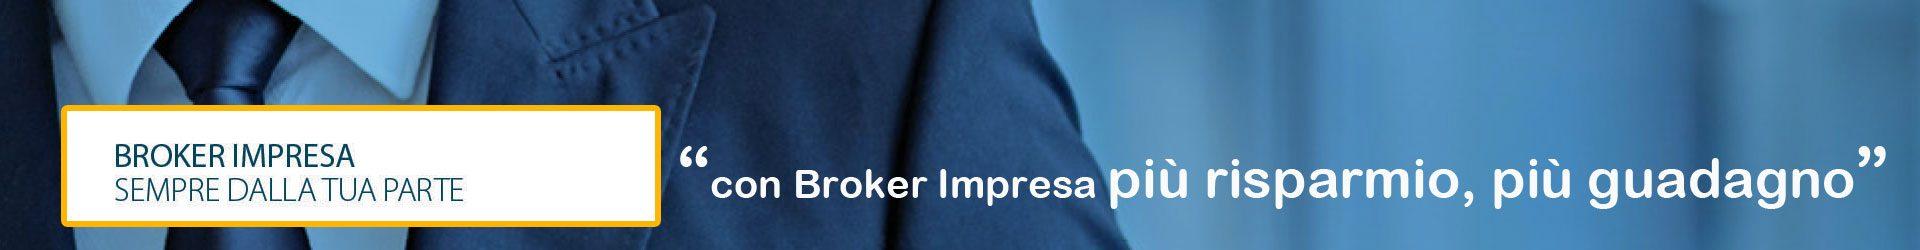 Broker Impresa